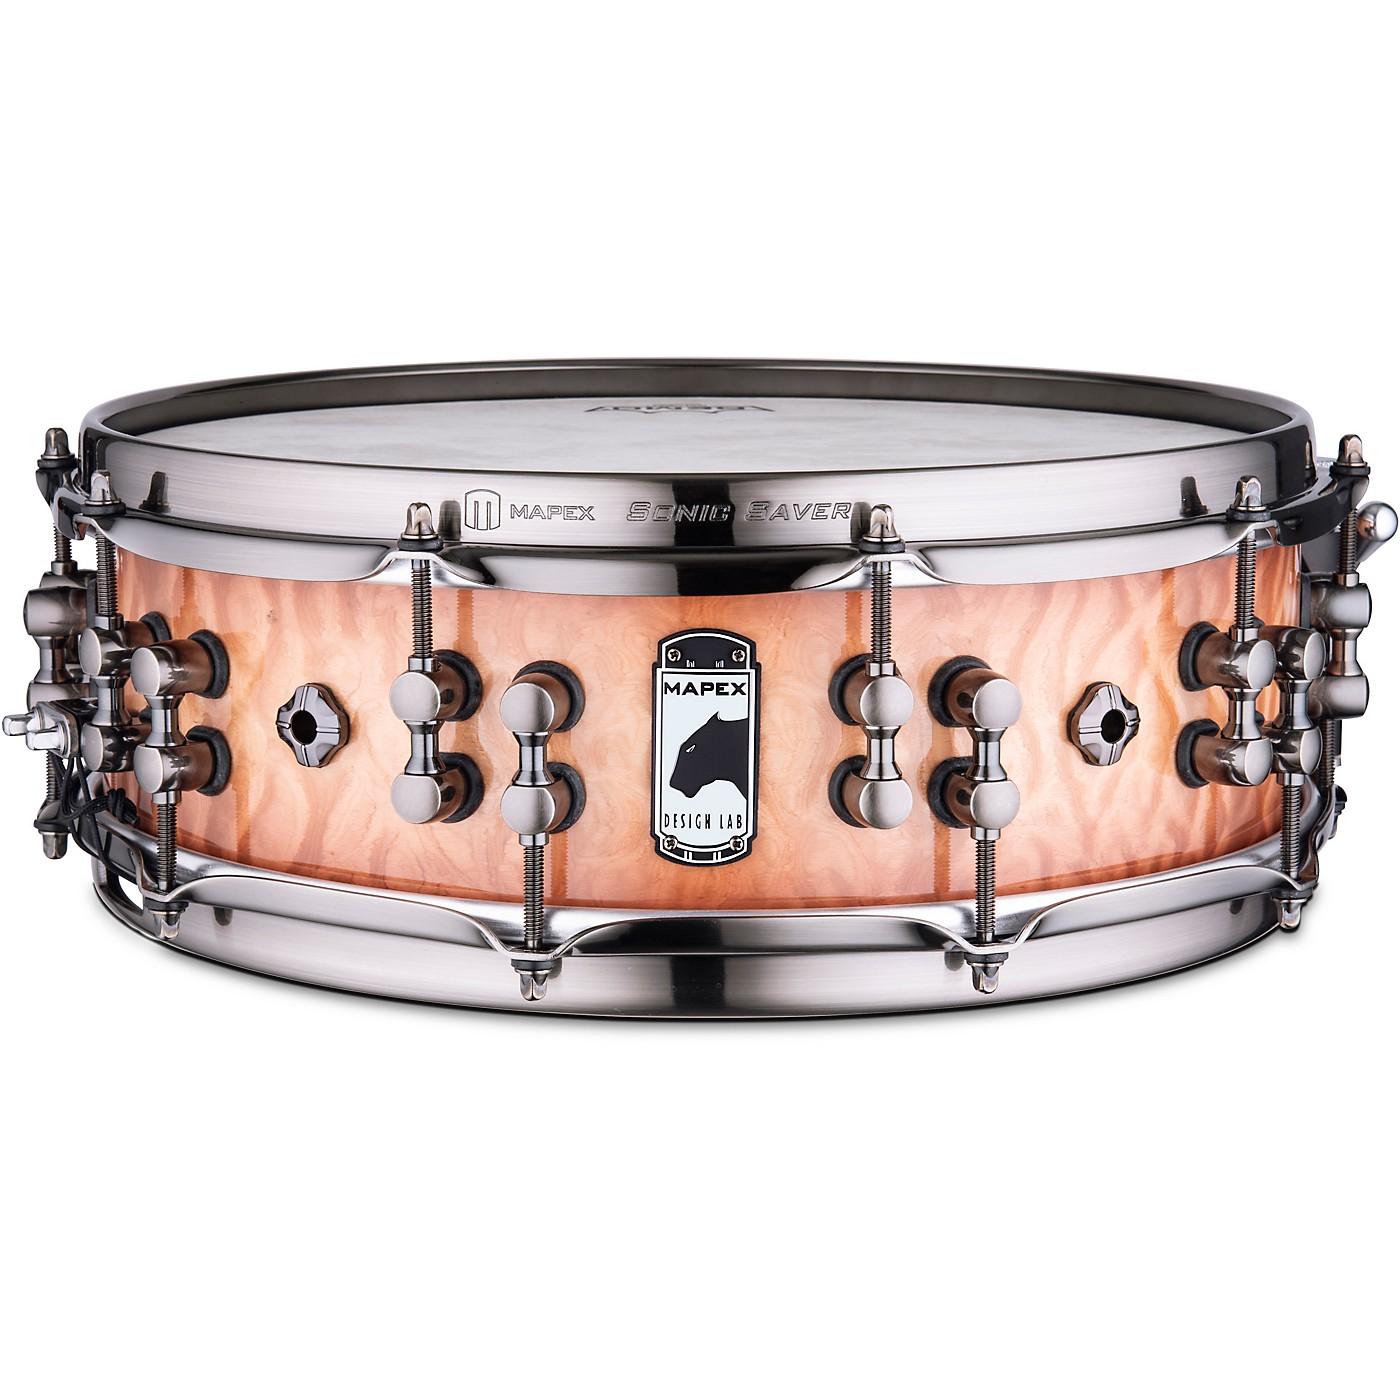 Mapex Black Panther Design Lab Versatus Snare Drum thumbnail